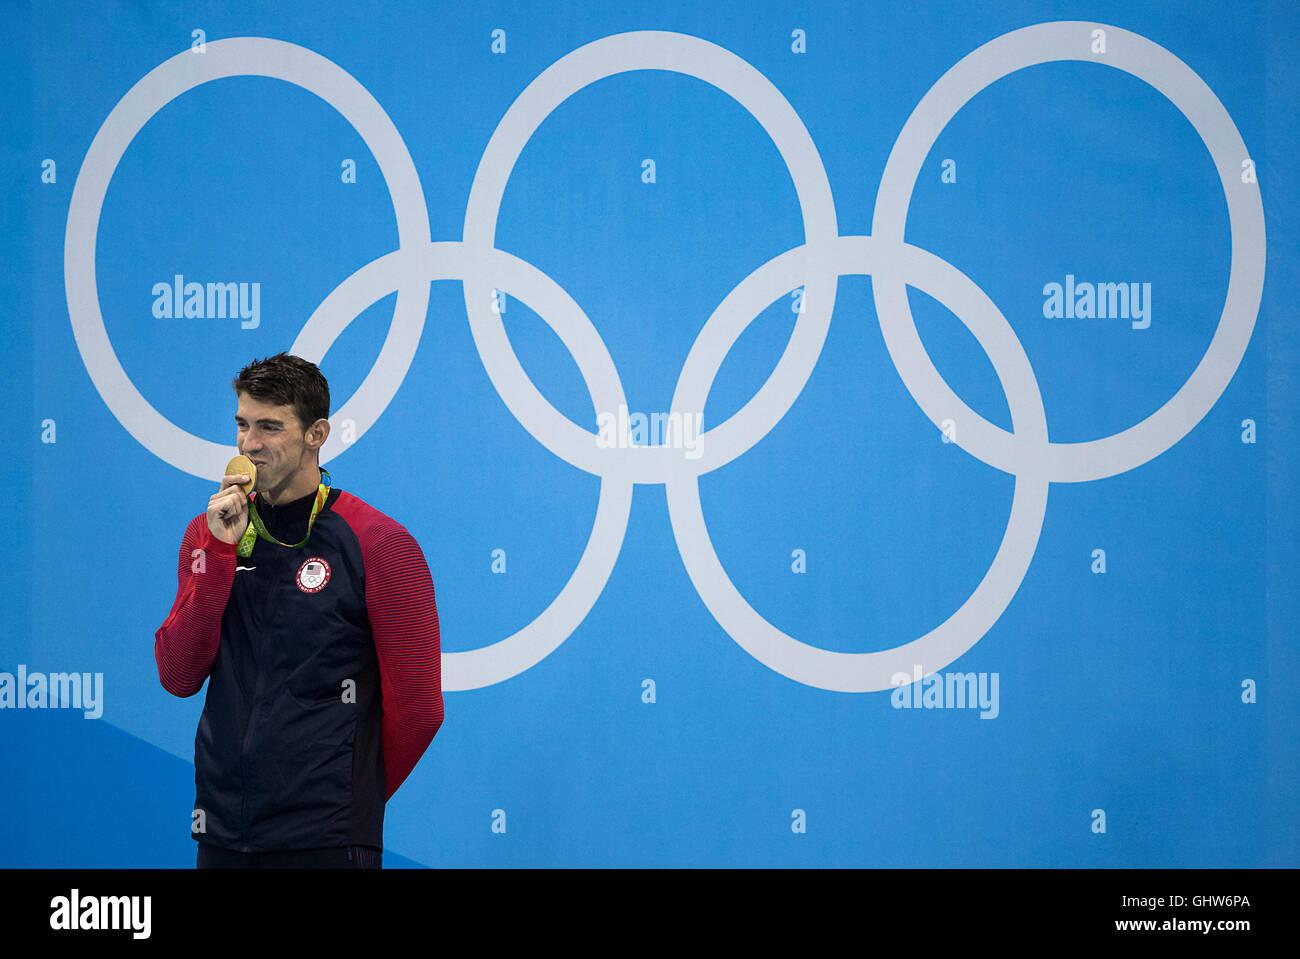 Rio de Janeiro, RJ, Brasile. 11 Ago, 2016. Nuoto Olimpiadi: Michael Phelps (USA) reagisce dopo la sua ventiduesima Immagini Stock